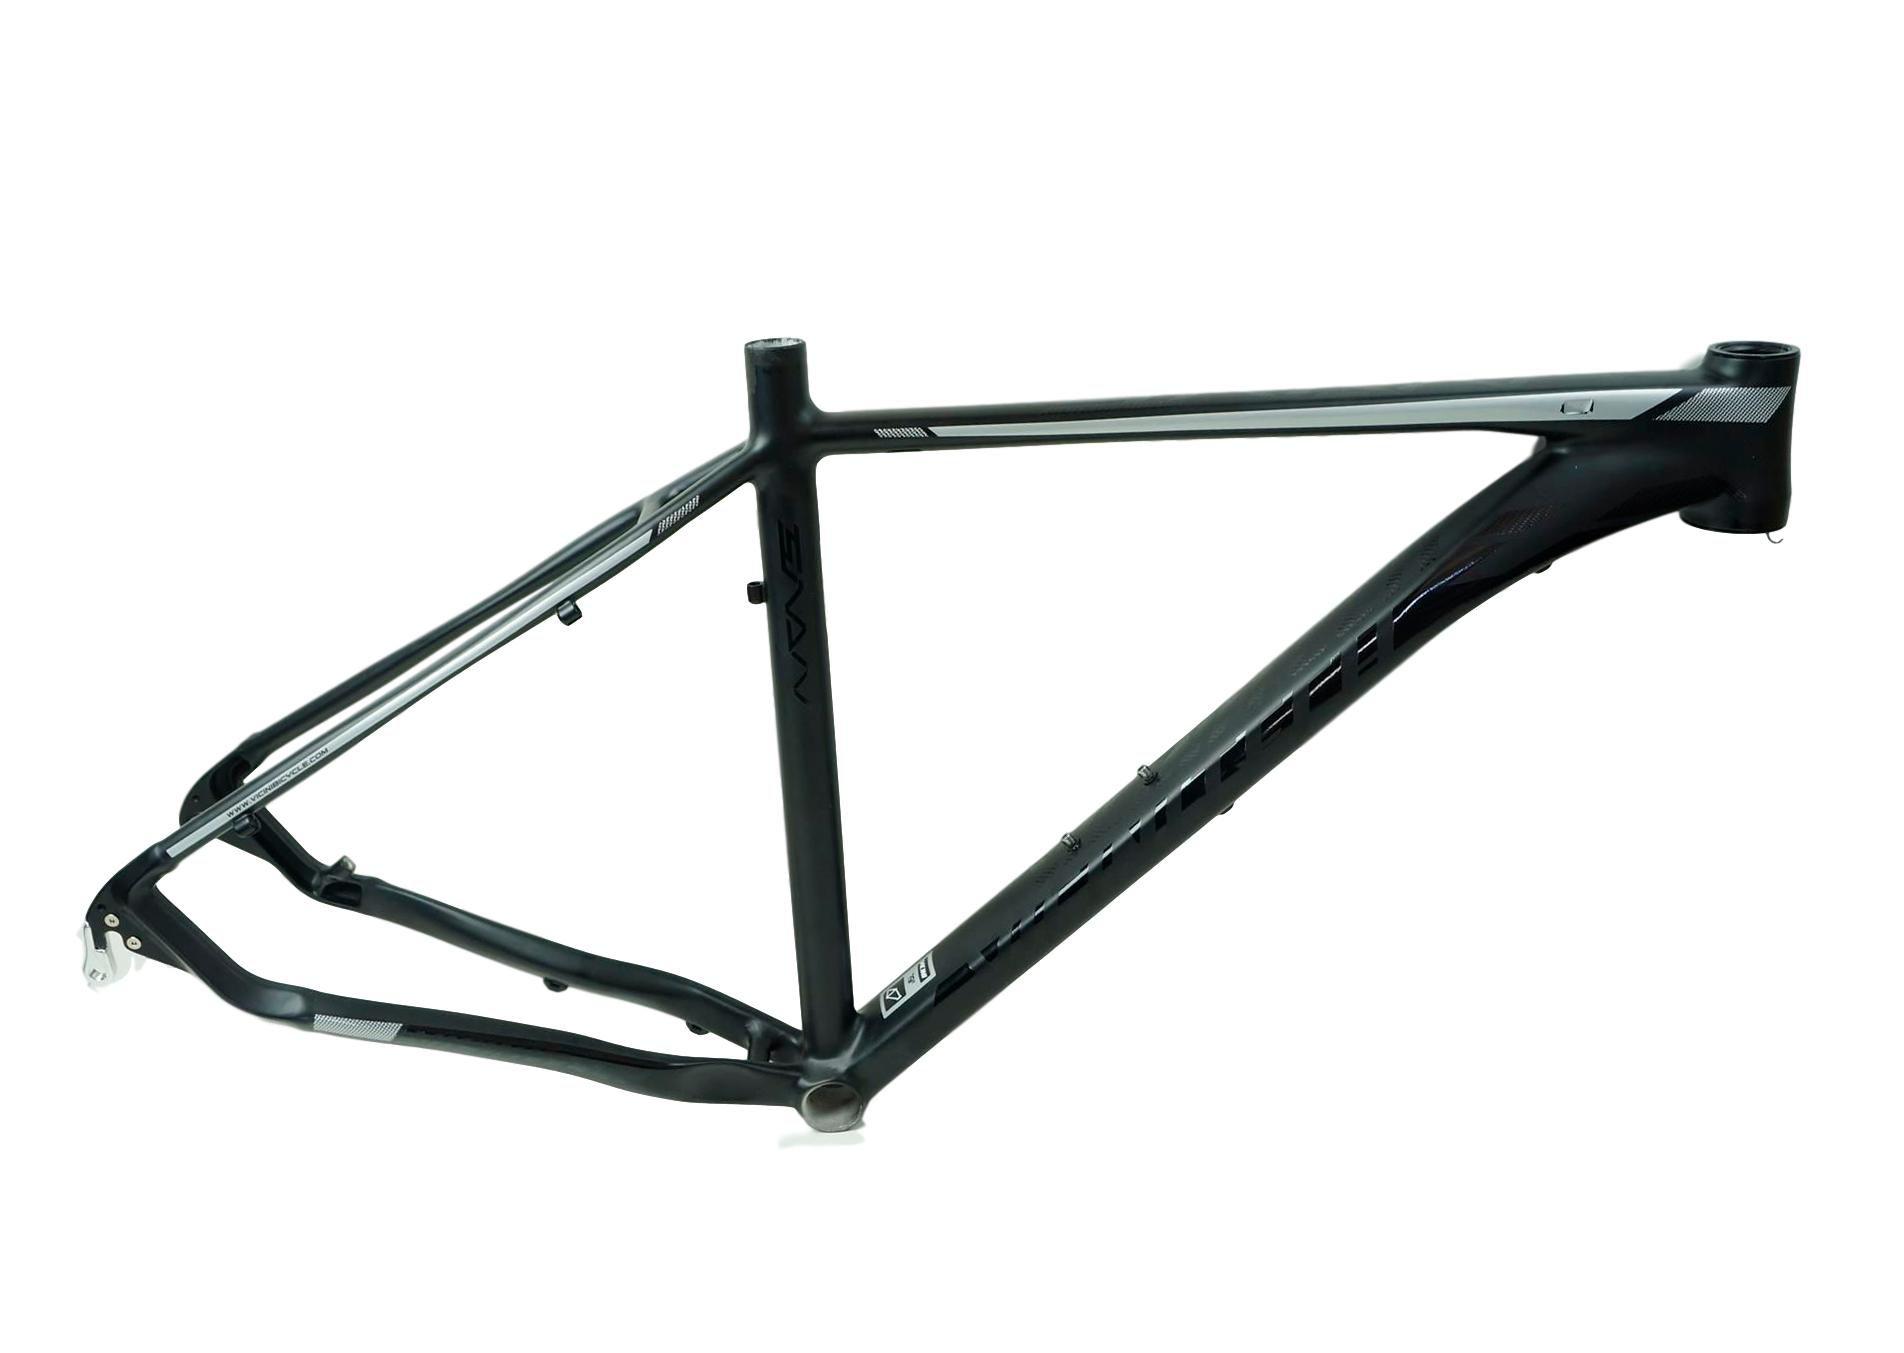 Quadro Bicicleta MTB Vicinitech 29er Savan em Aluminio Eixo 9mm Tamanho 17